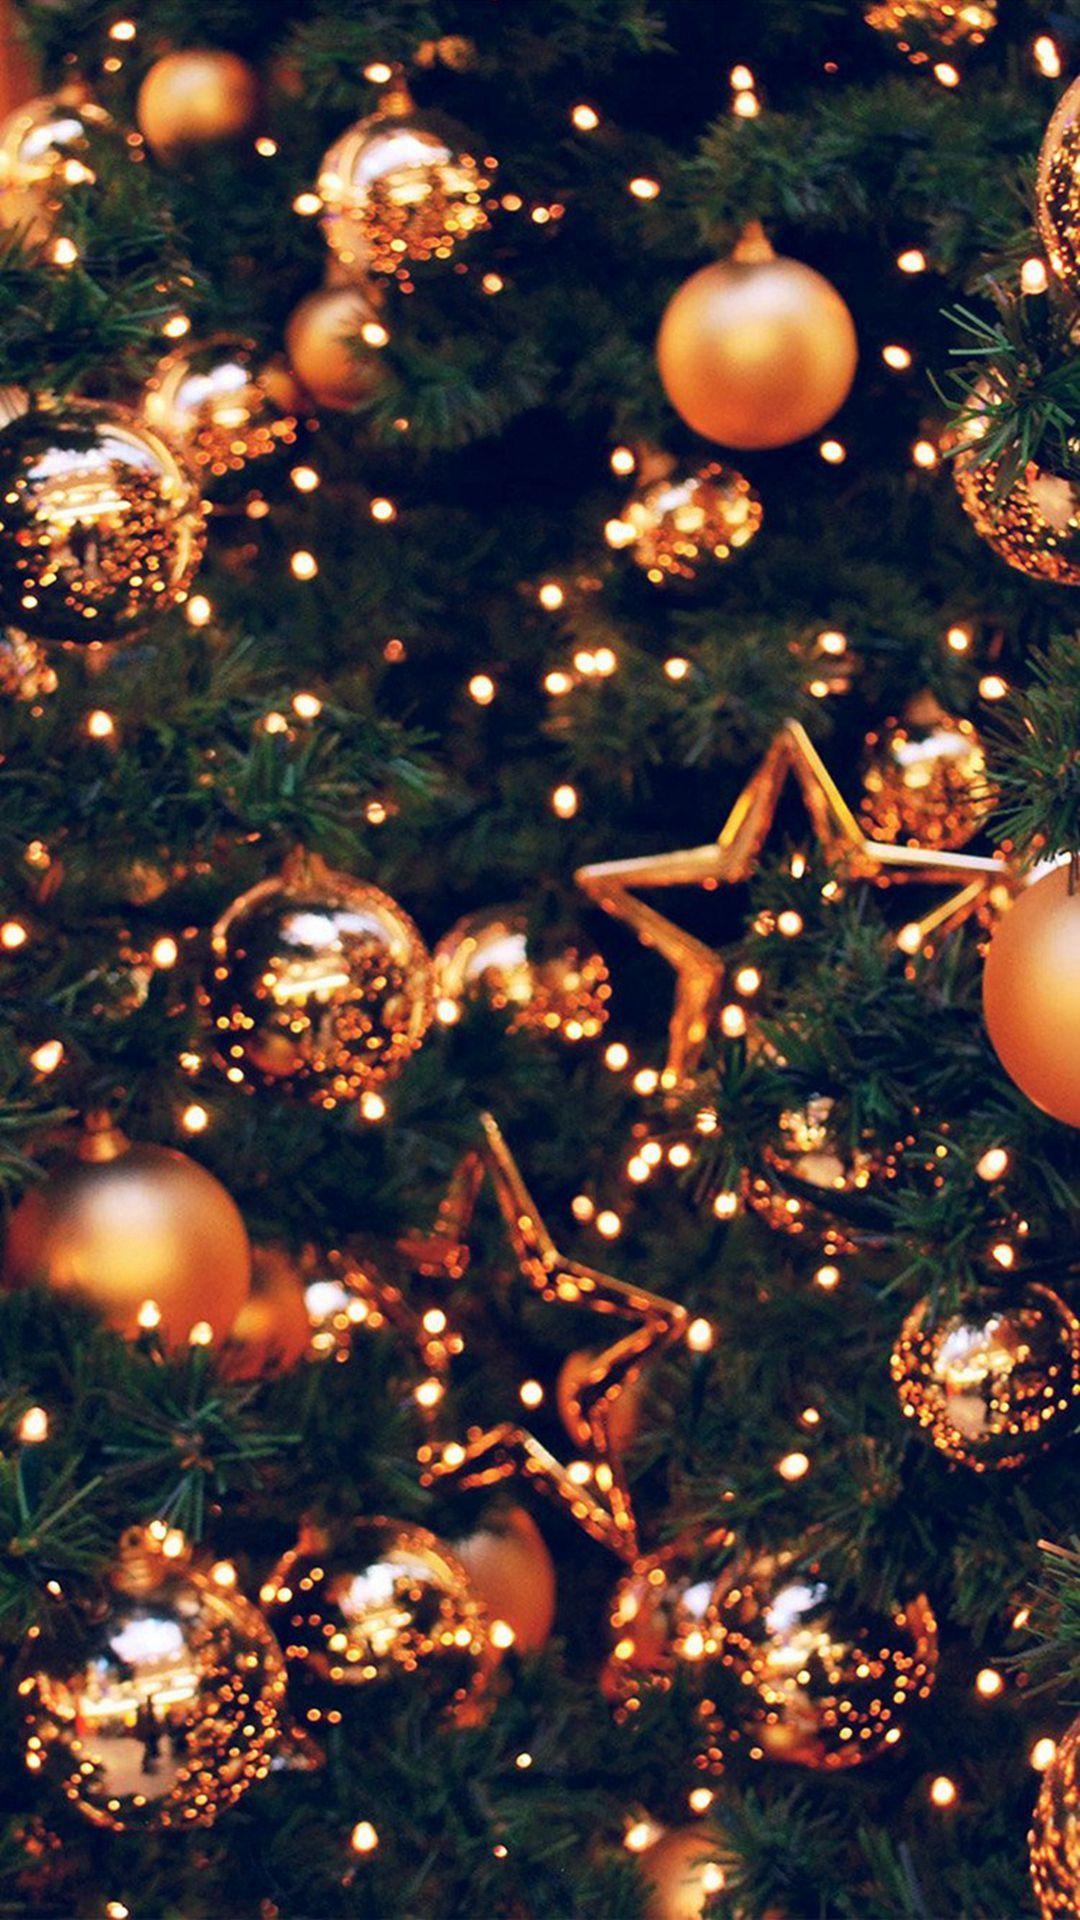 43 Christmas Wallpaper Backgrounds Https Silahsilah Com Design 43 Christmas Wallpaper Back Wallpaper Iphone Christmas Xmas Wallpaper Christmas Wallpaper Free